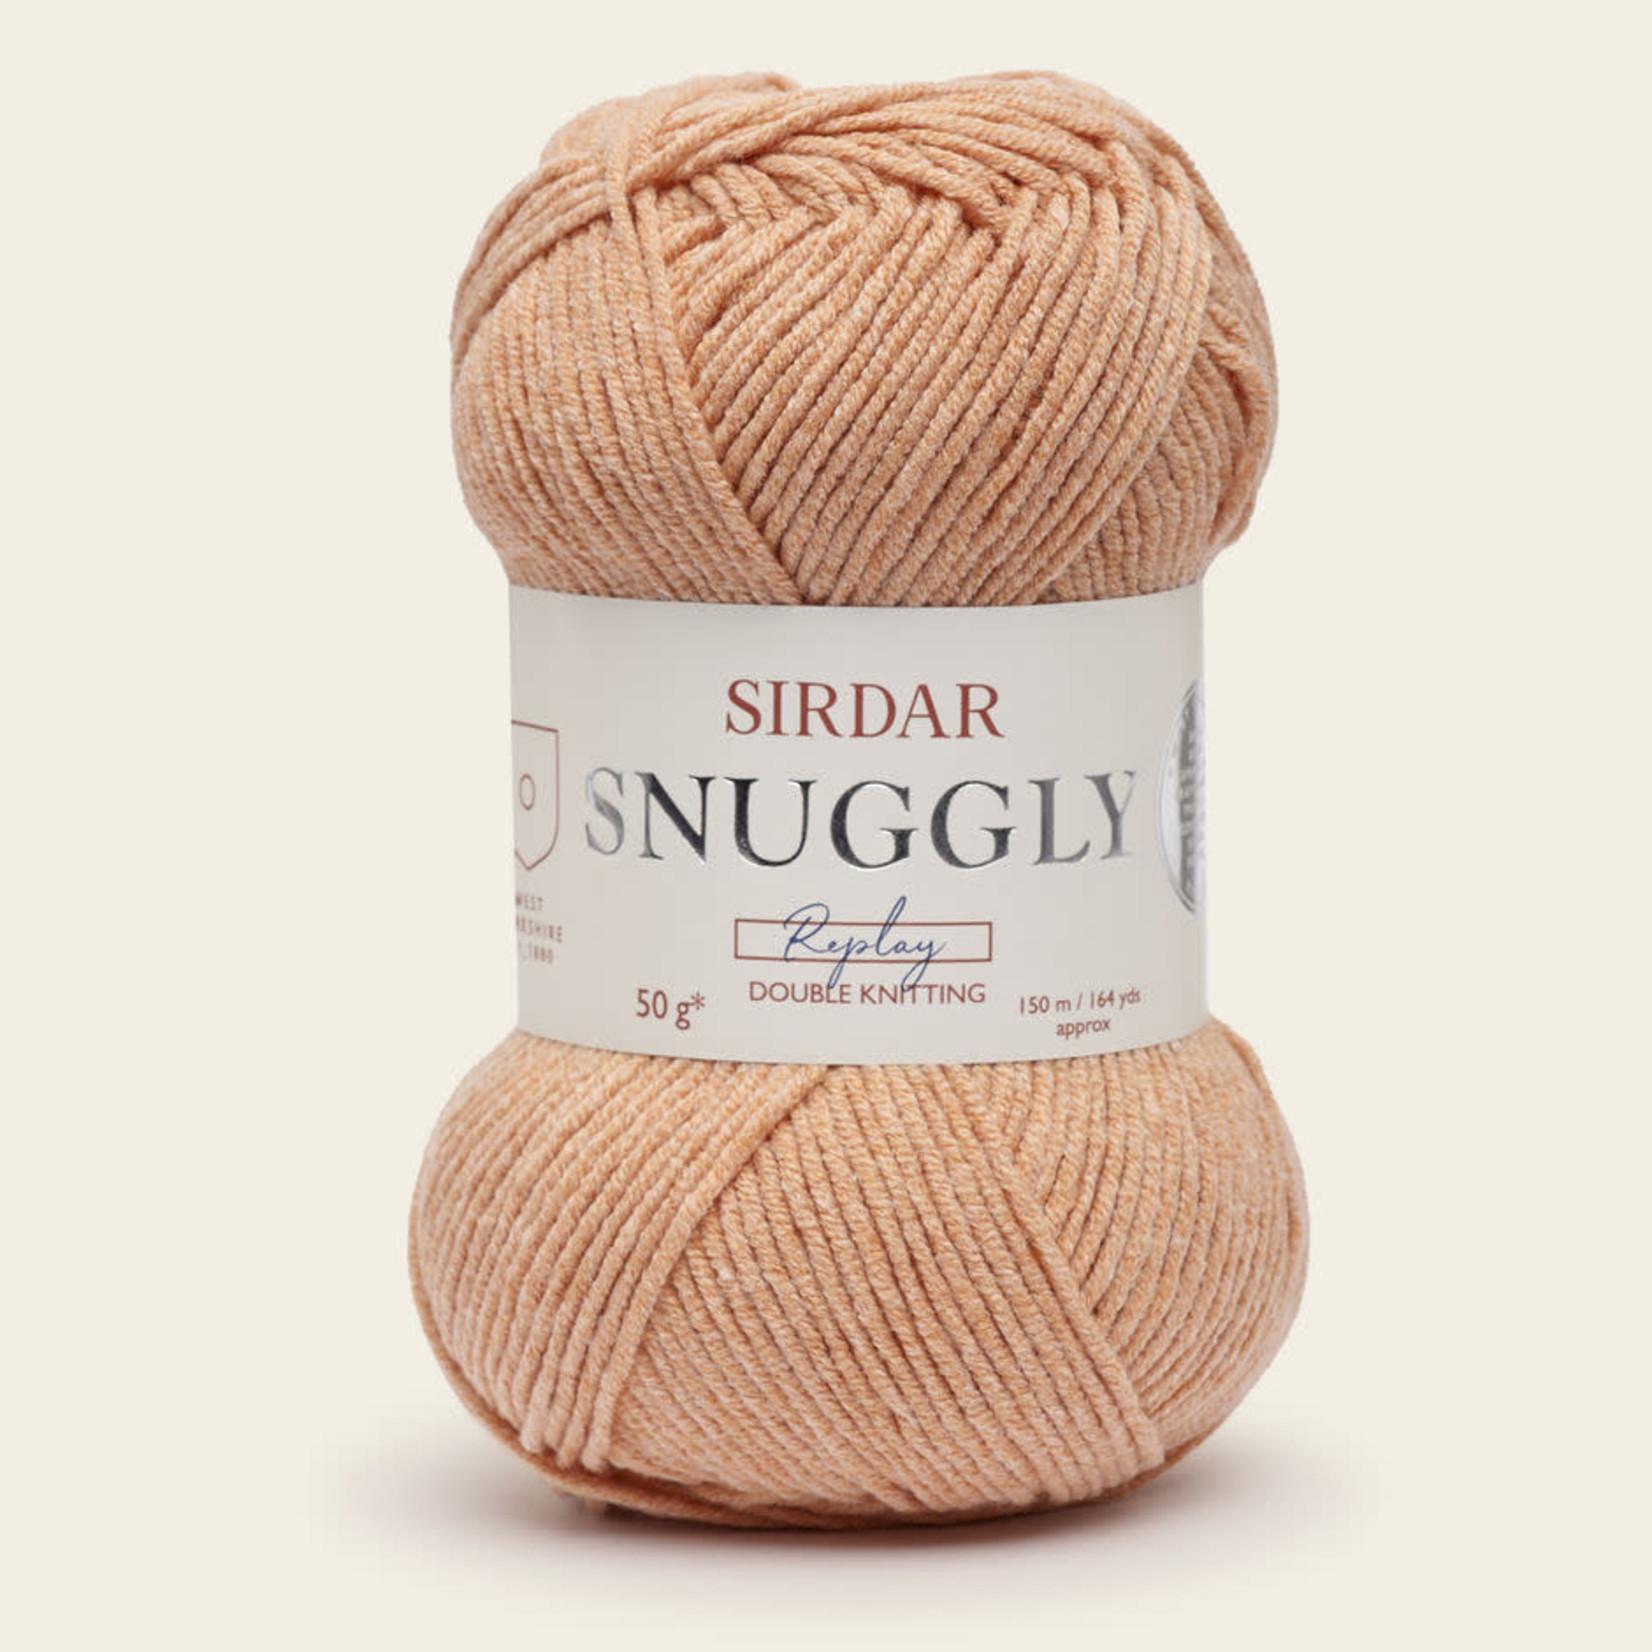 Sirdar Snuggly Replay